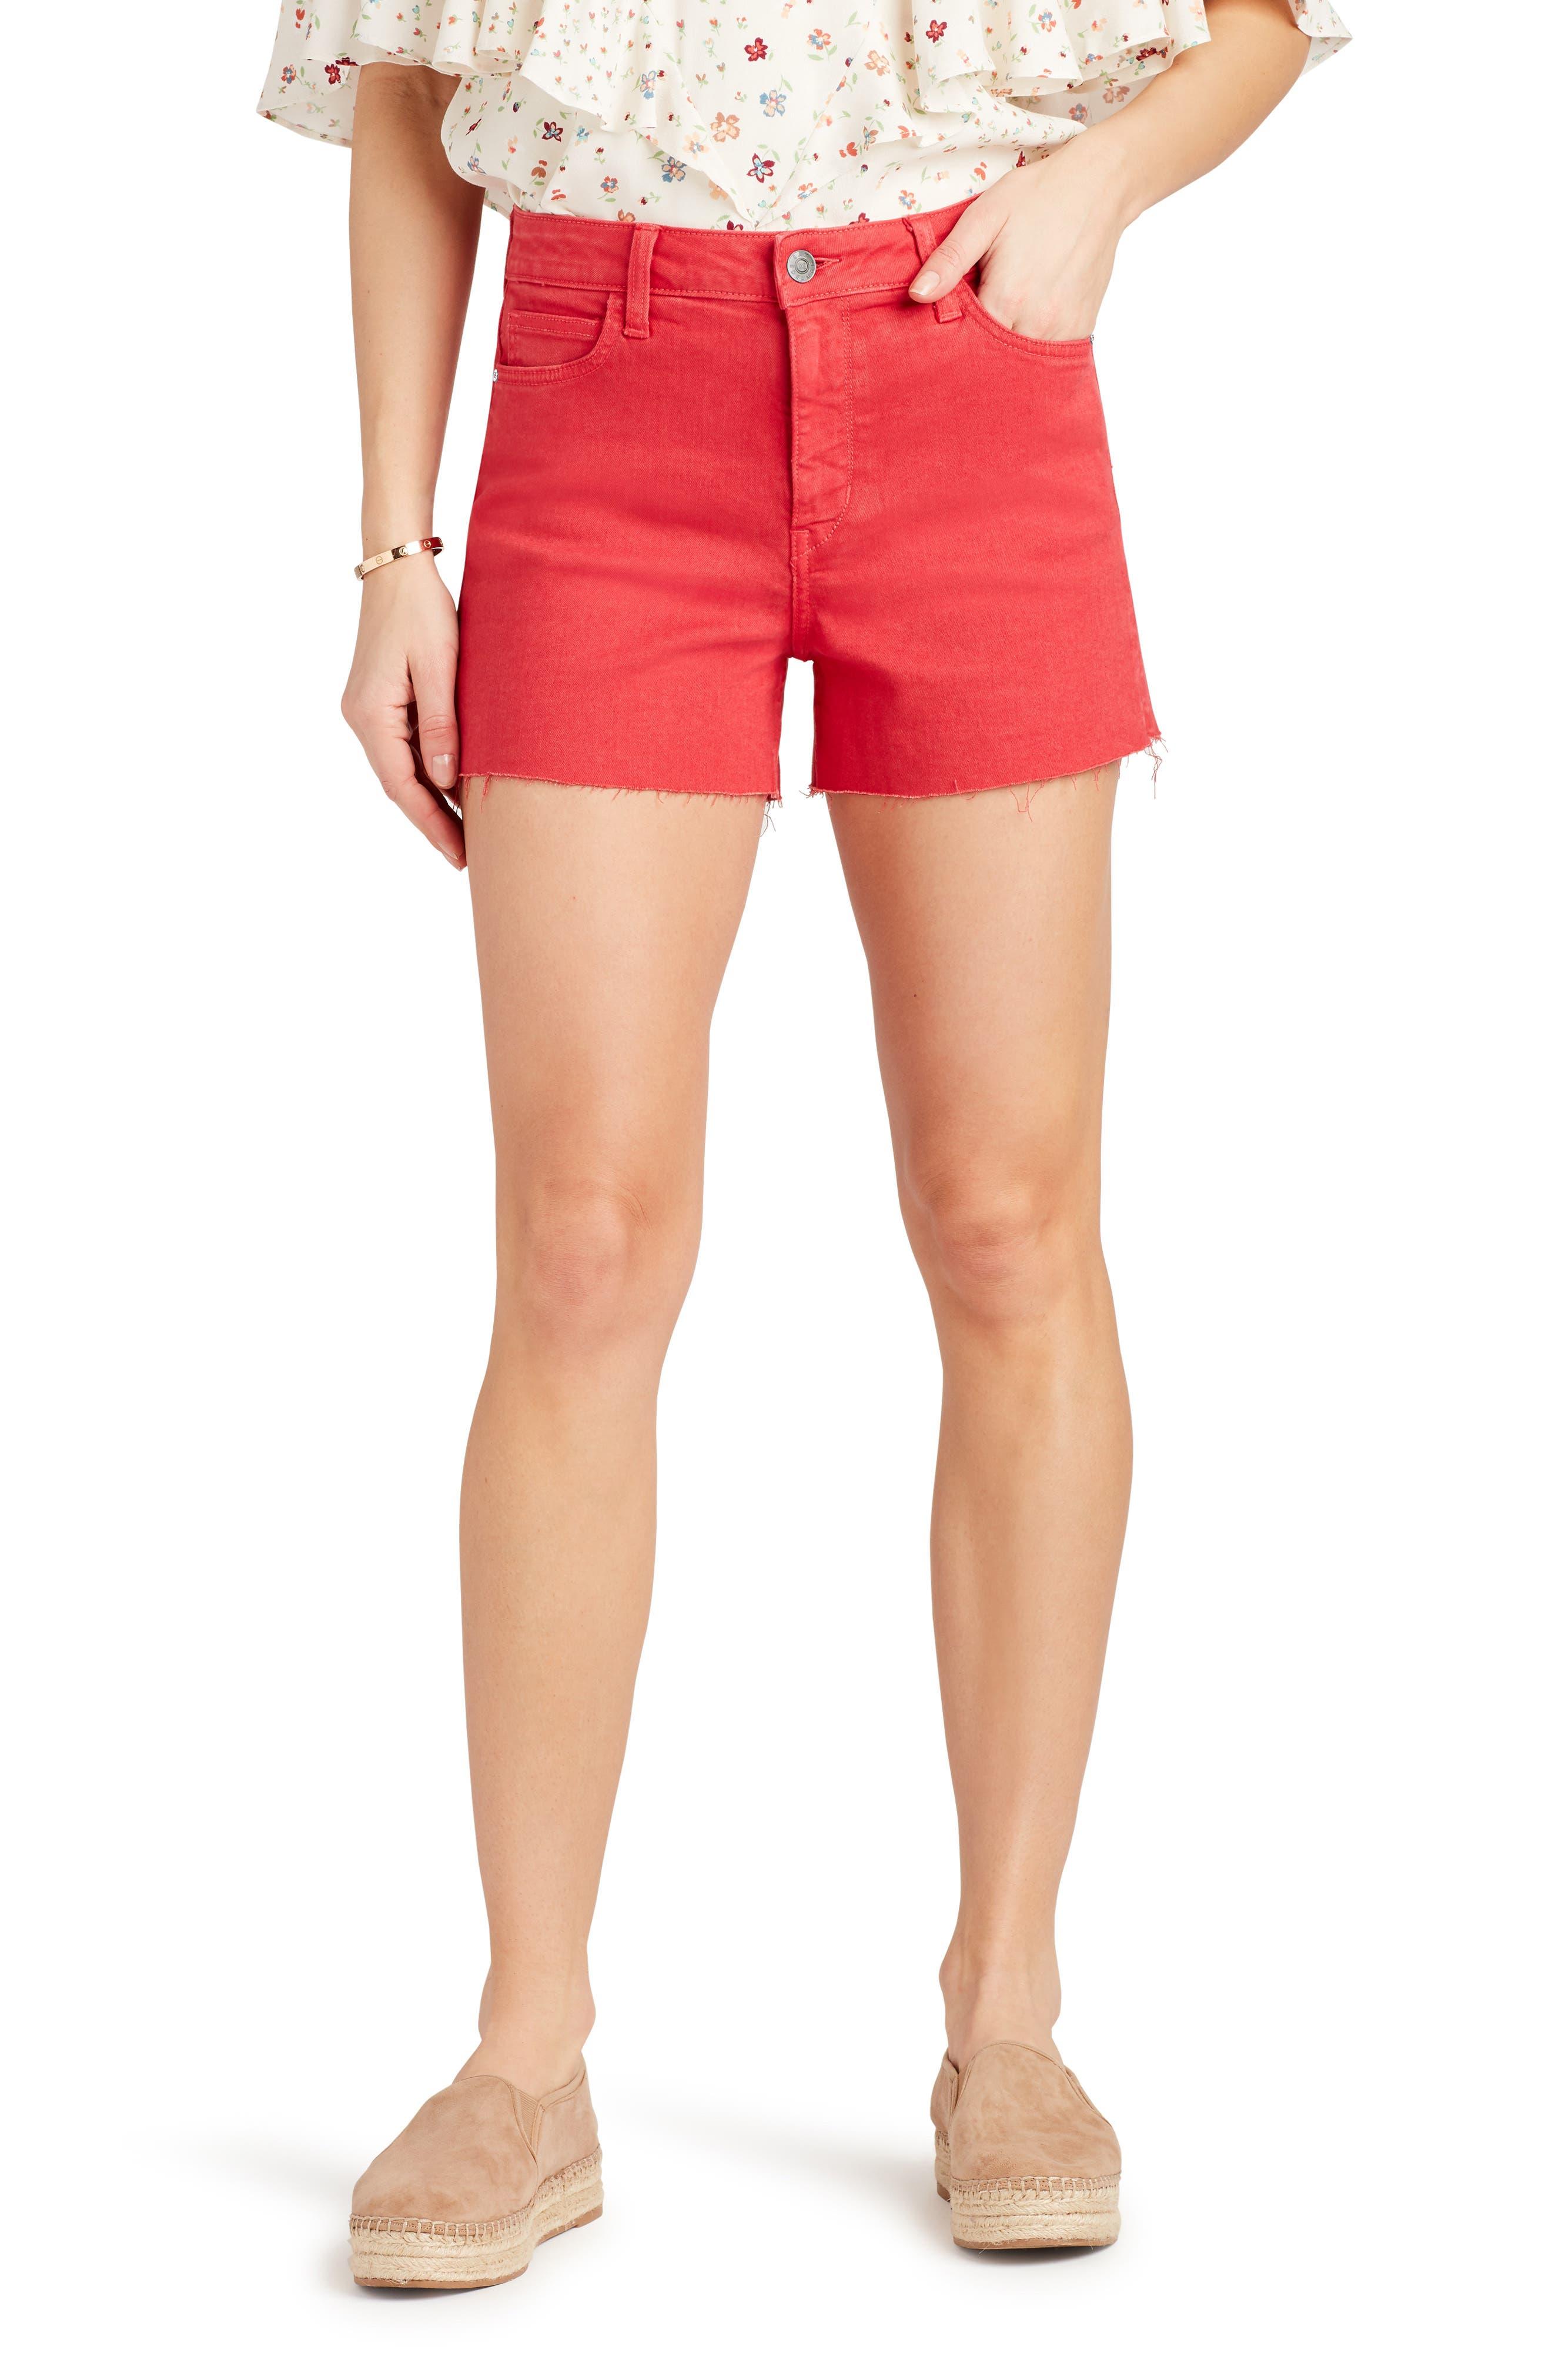 Image of Sam Edelman The Stiletto Raw Hem Cutoff Denim Shorts